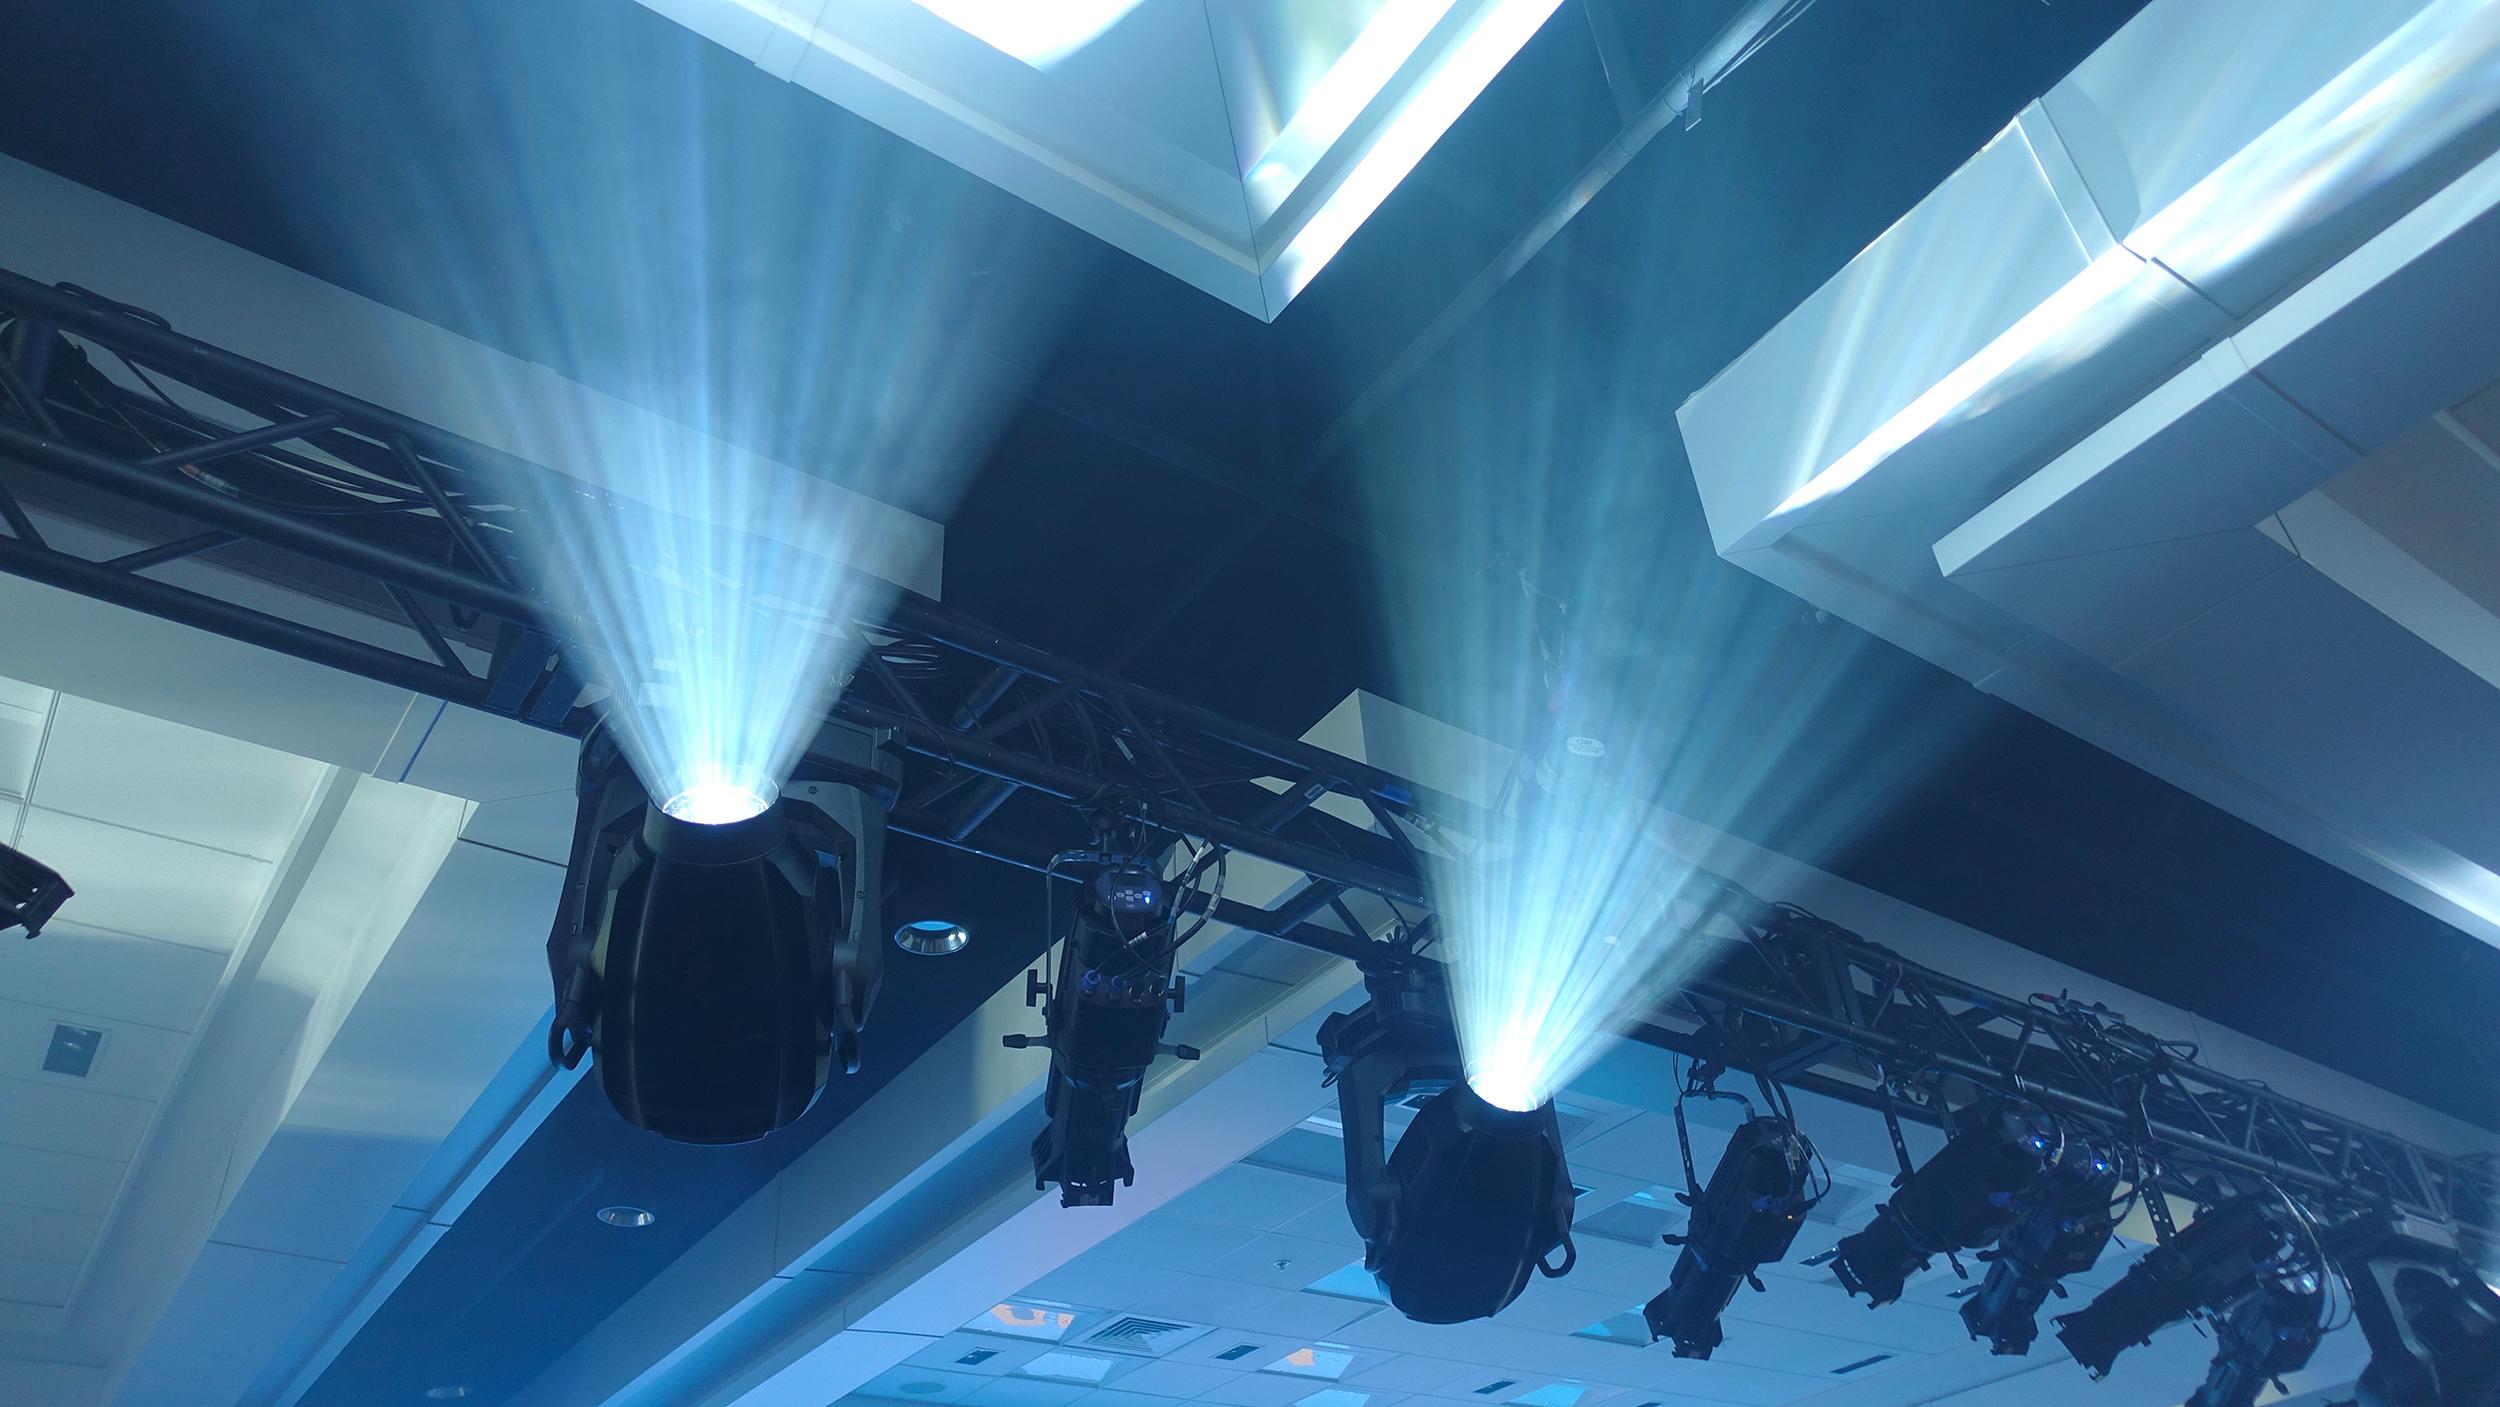 Truss spotlights and haze